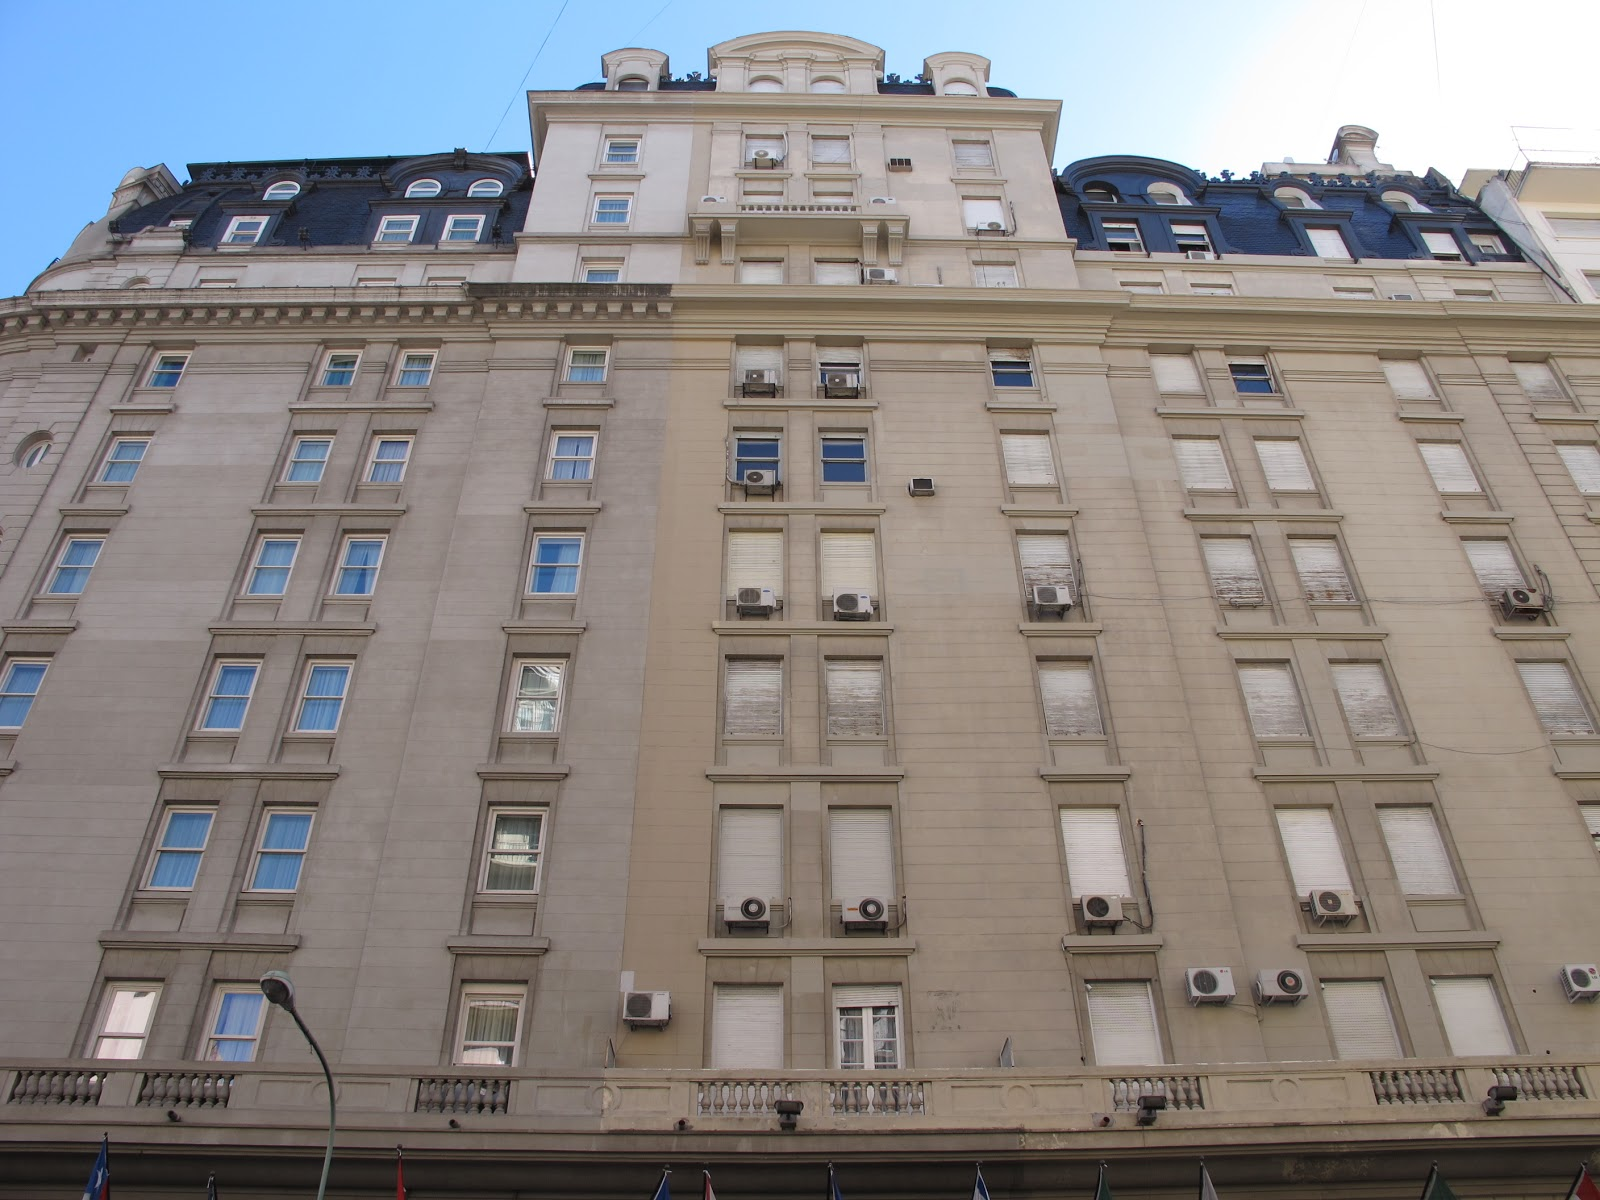 Edificios y monumentos de buenos aires alvear palace hotel for Hotel design buenos aires marcelo t de alvear